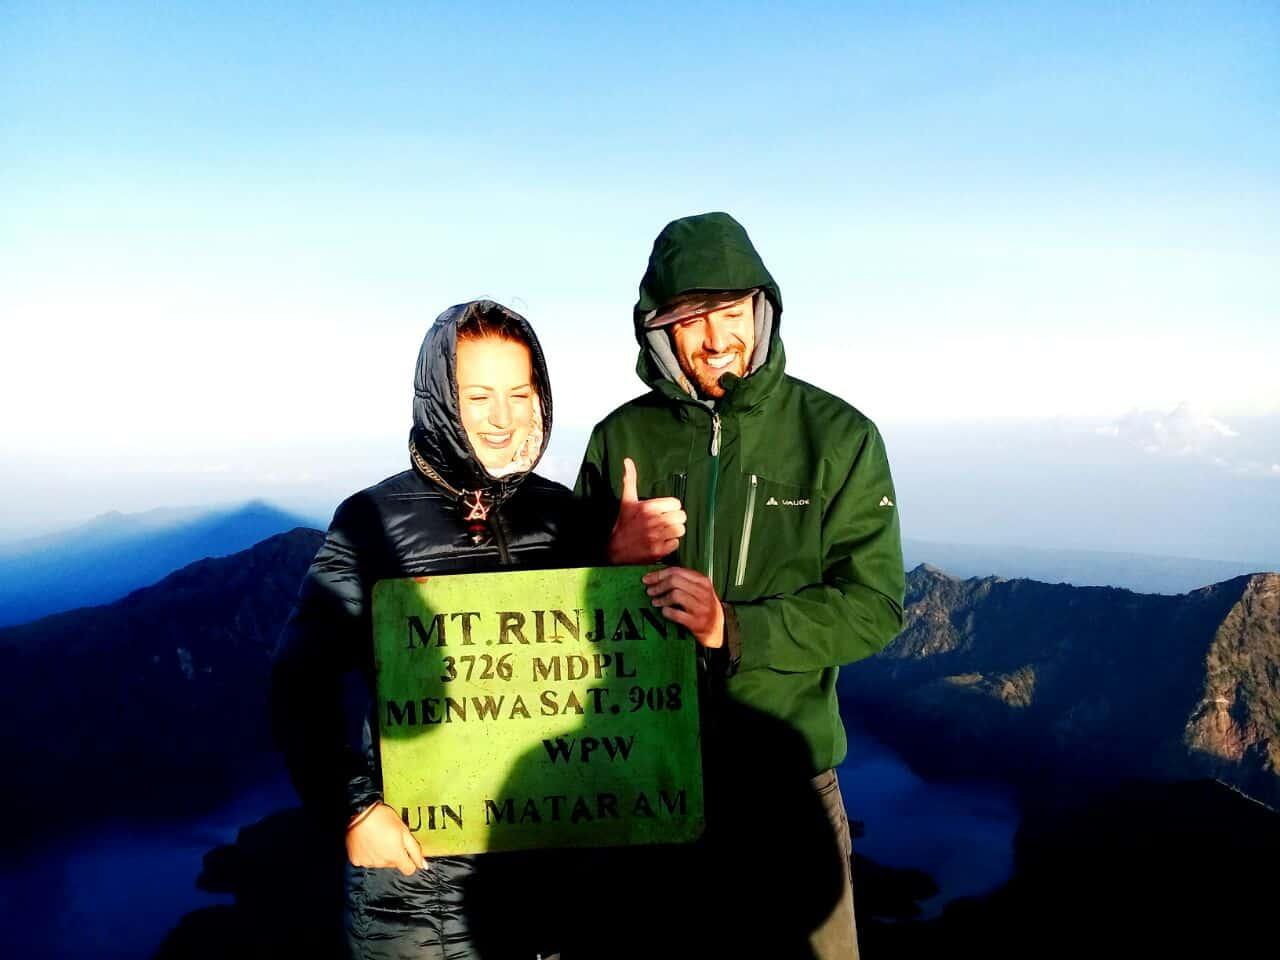 Mount Rinjani Trekking Company